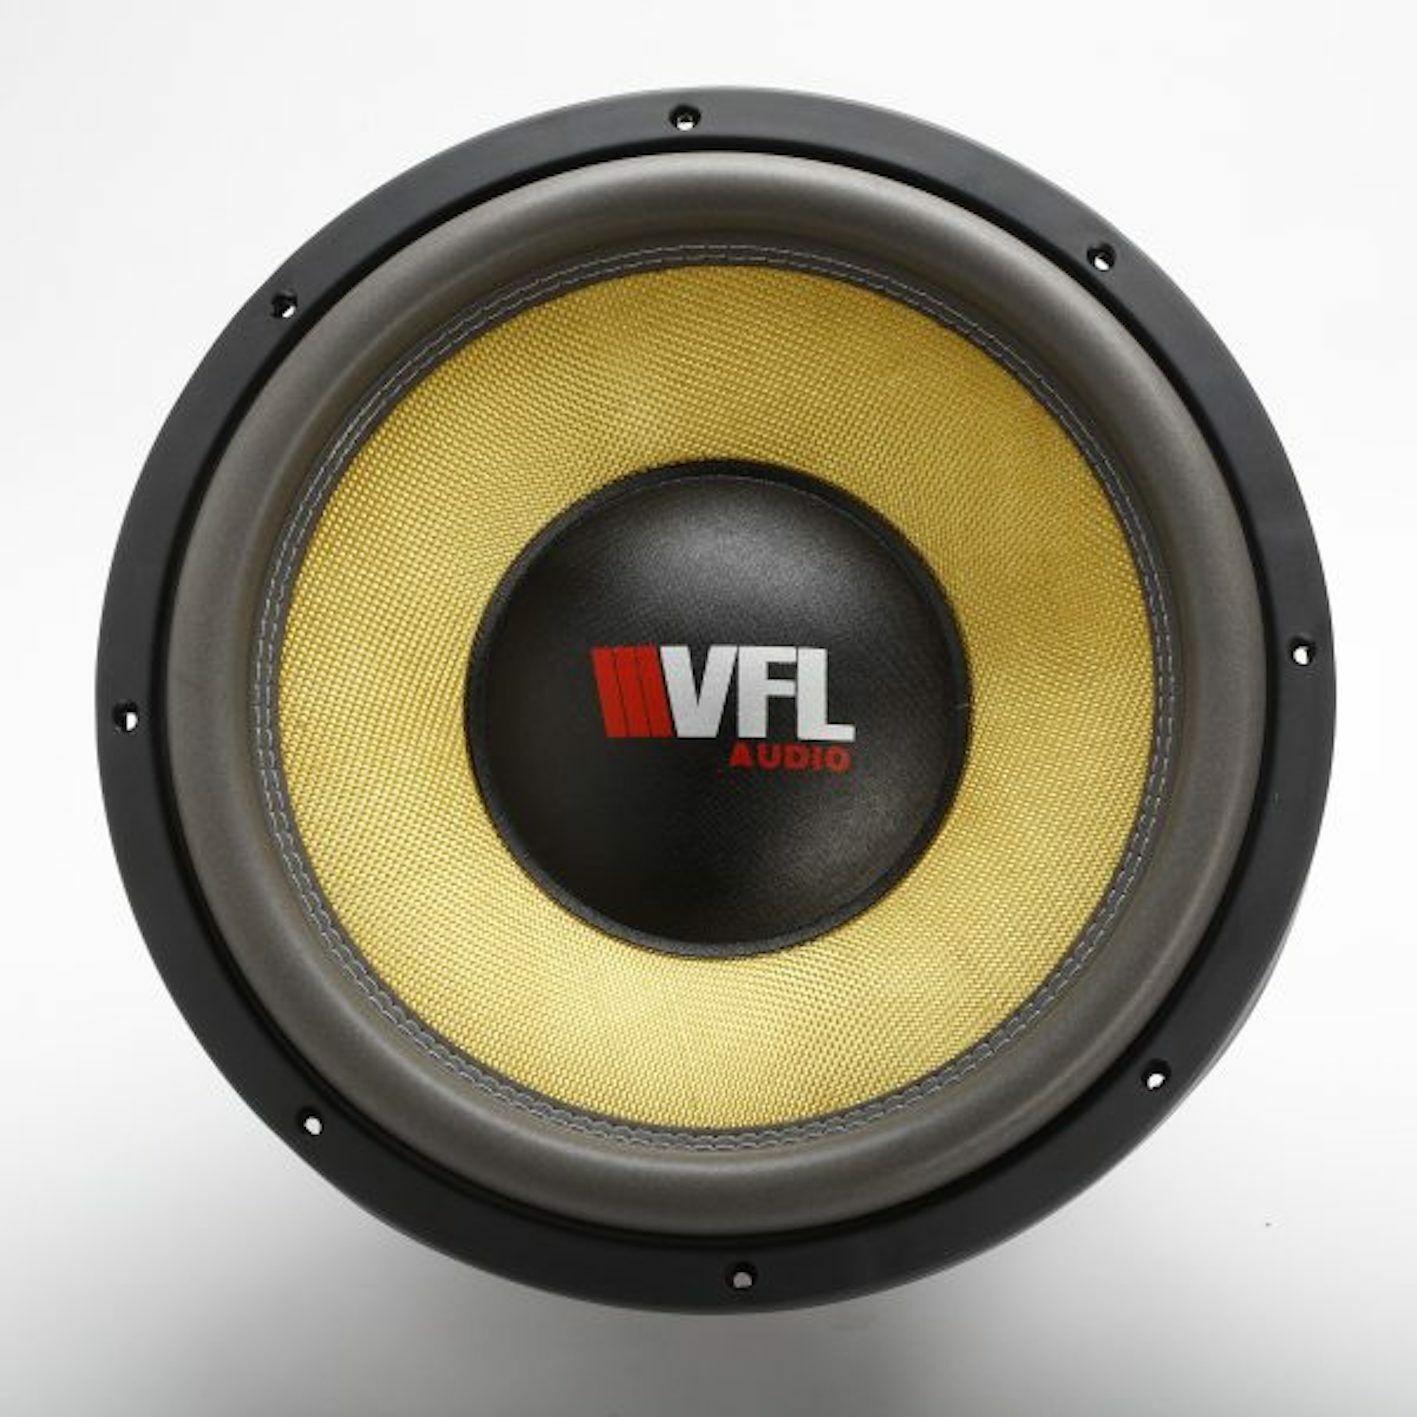 VFL Audio Comp15 15  Subwoofer  NEW  AUTHORIZED DISTRIBUTOR